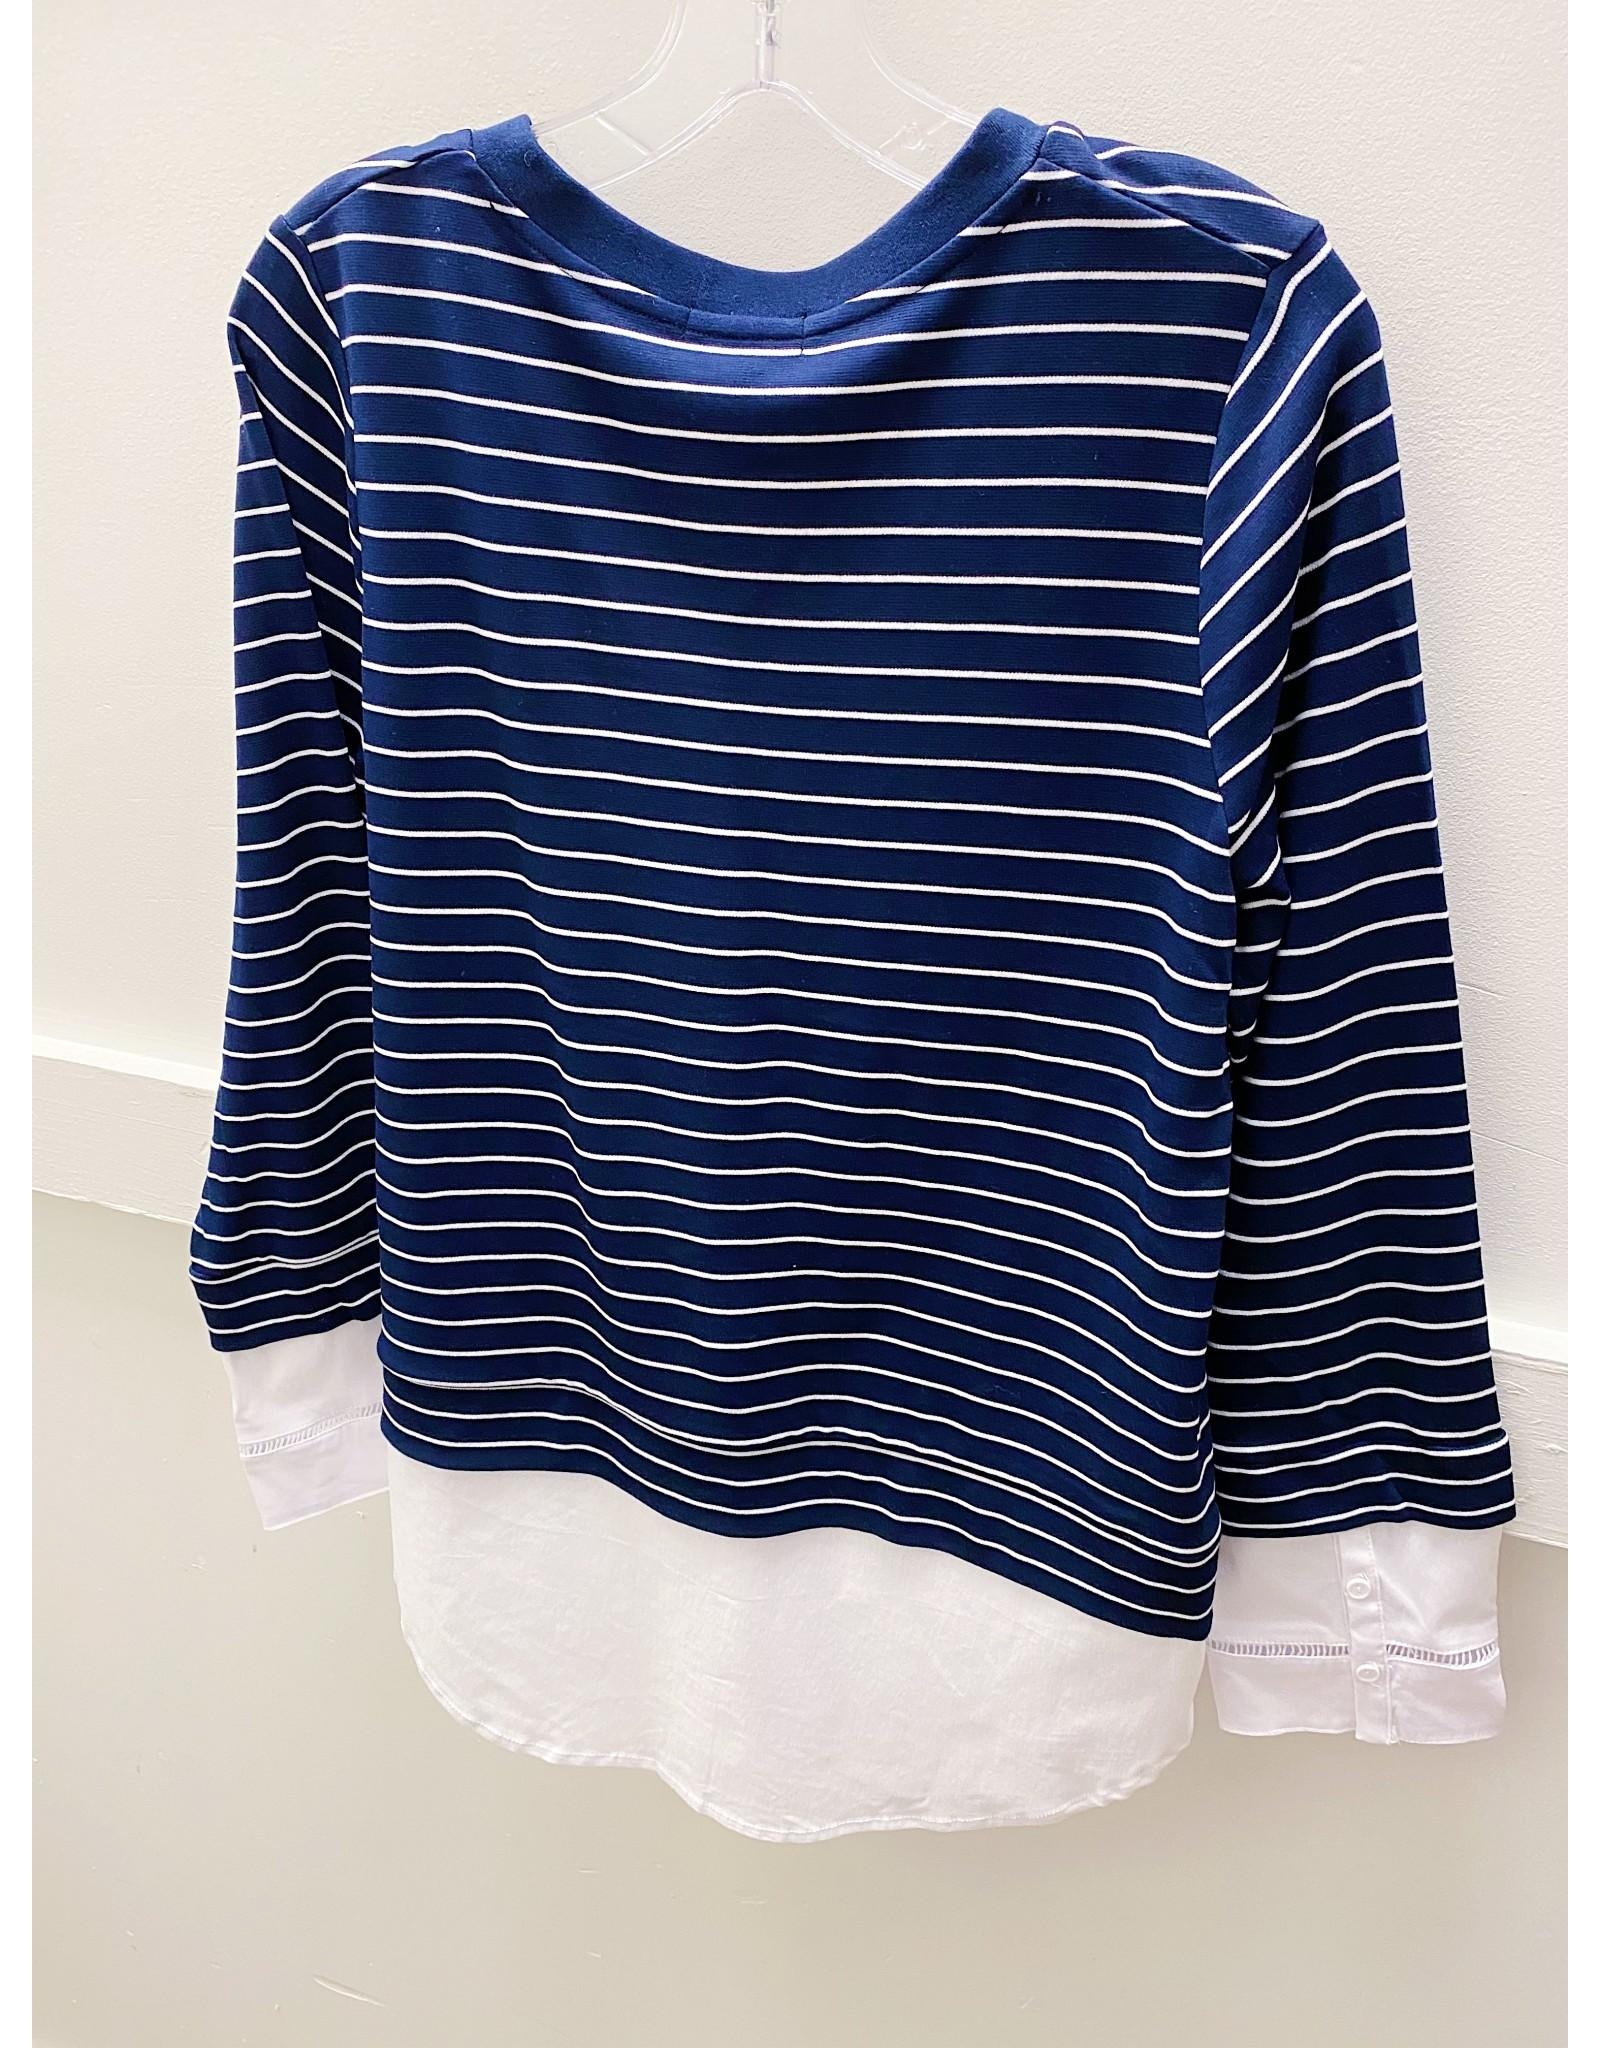 Renuar Stripe Knit Top - SMALL